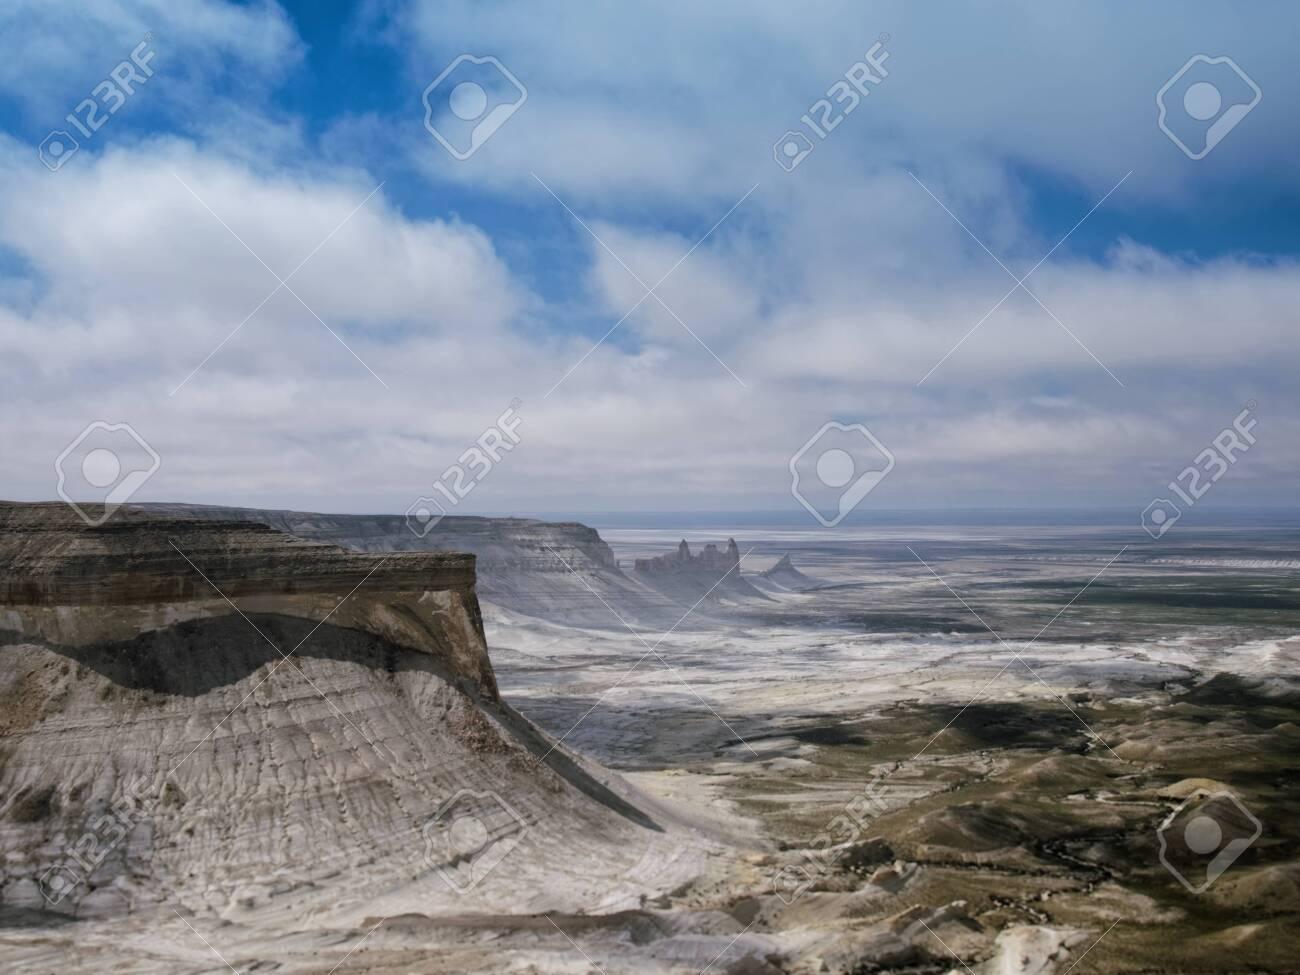 Chalk cliffs and ledges of the plateau Aktolagai. Plateau Aktolagai, Kazakhstan 2019.Expedition site Turister.ru. - 142252652